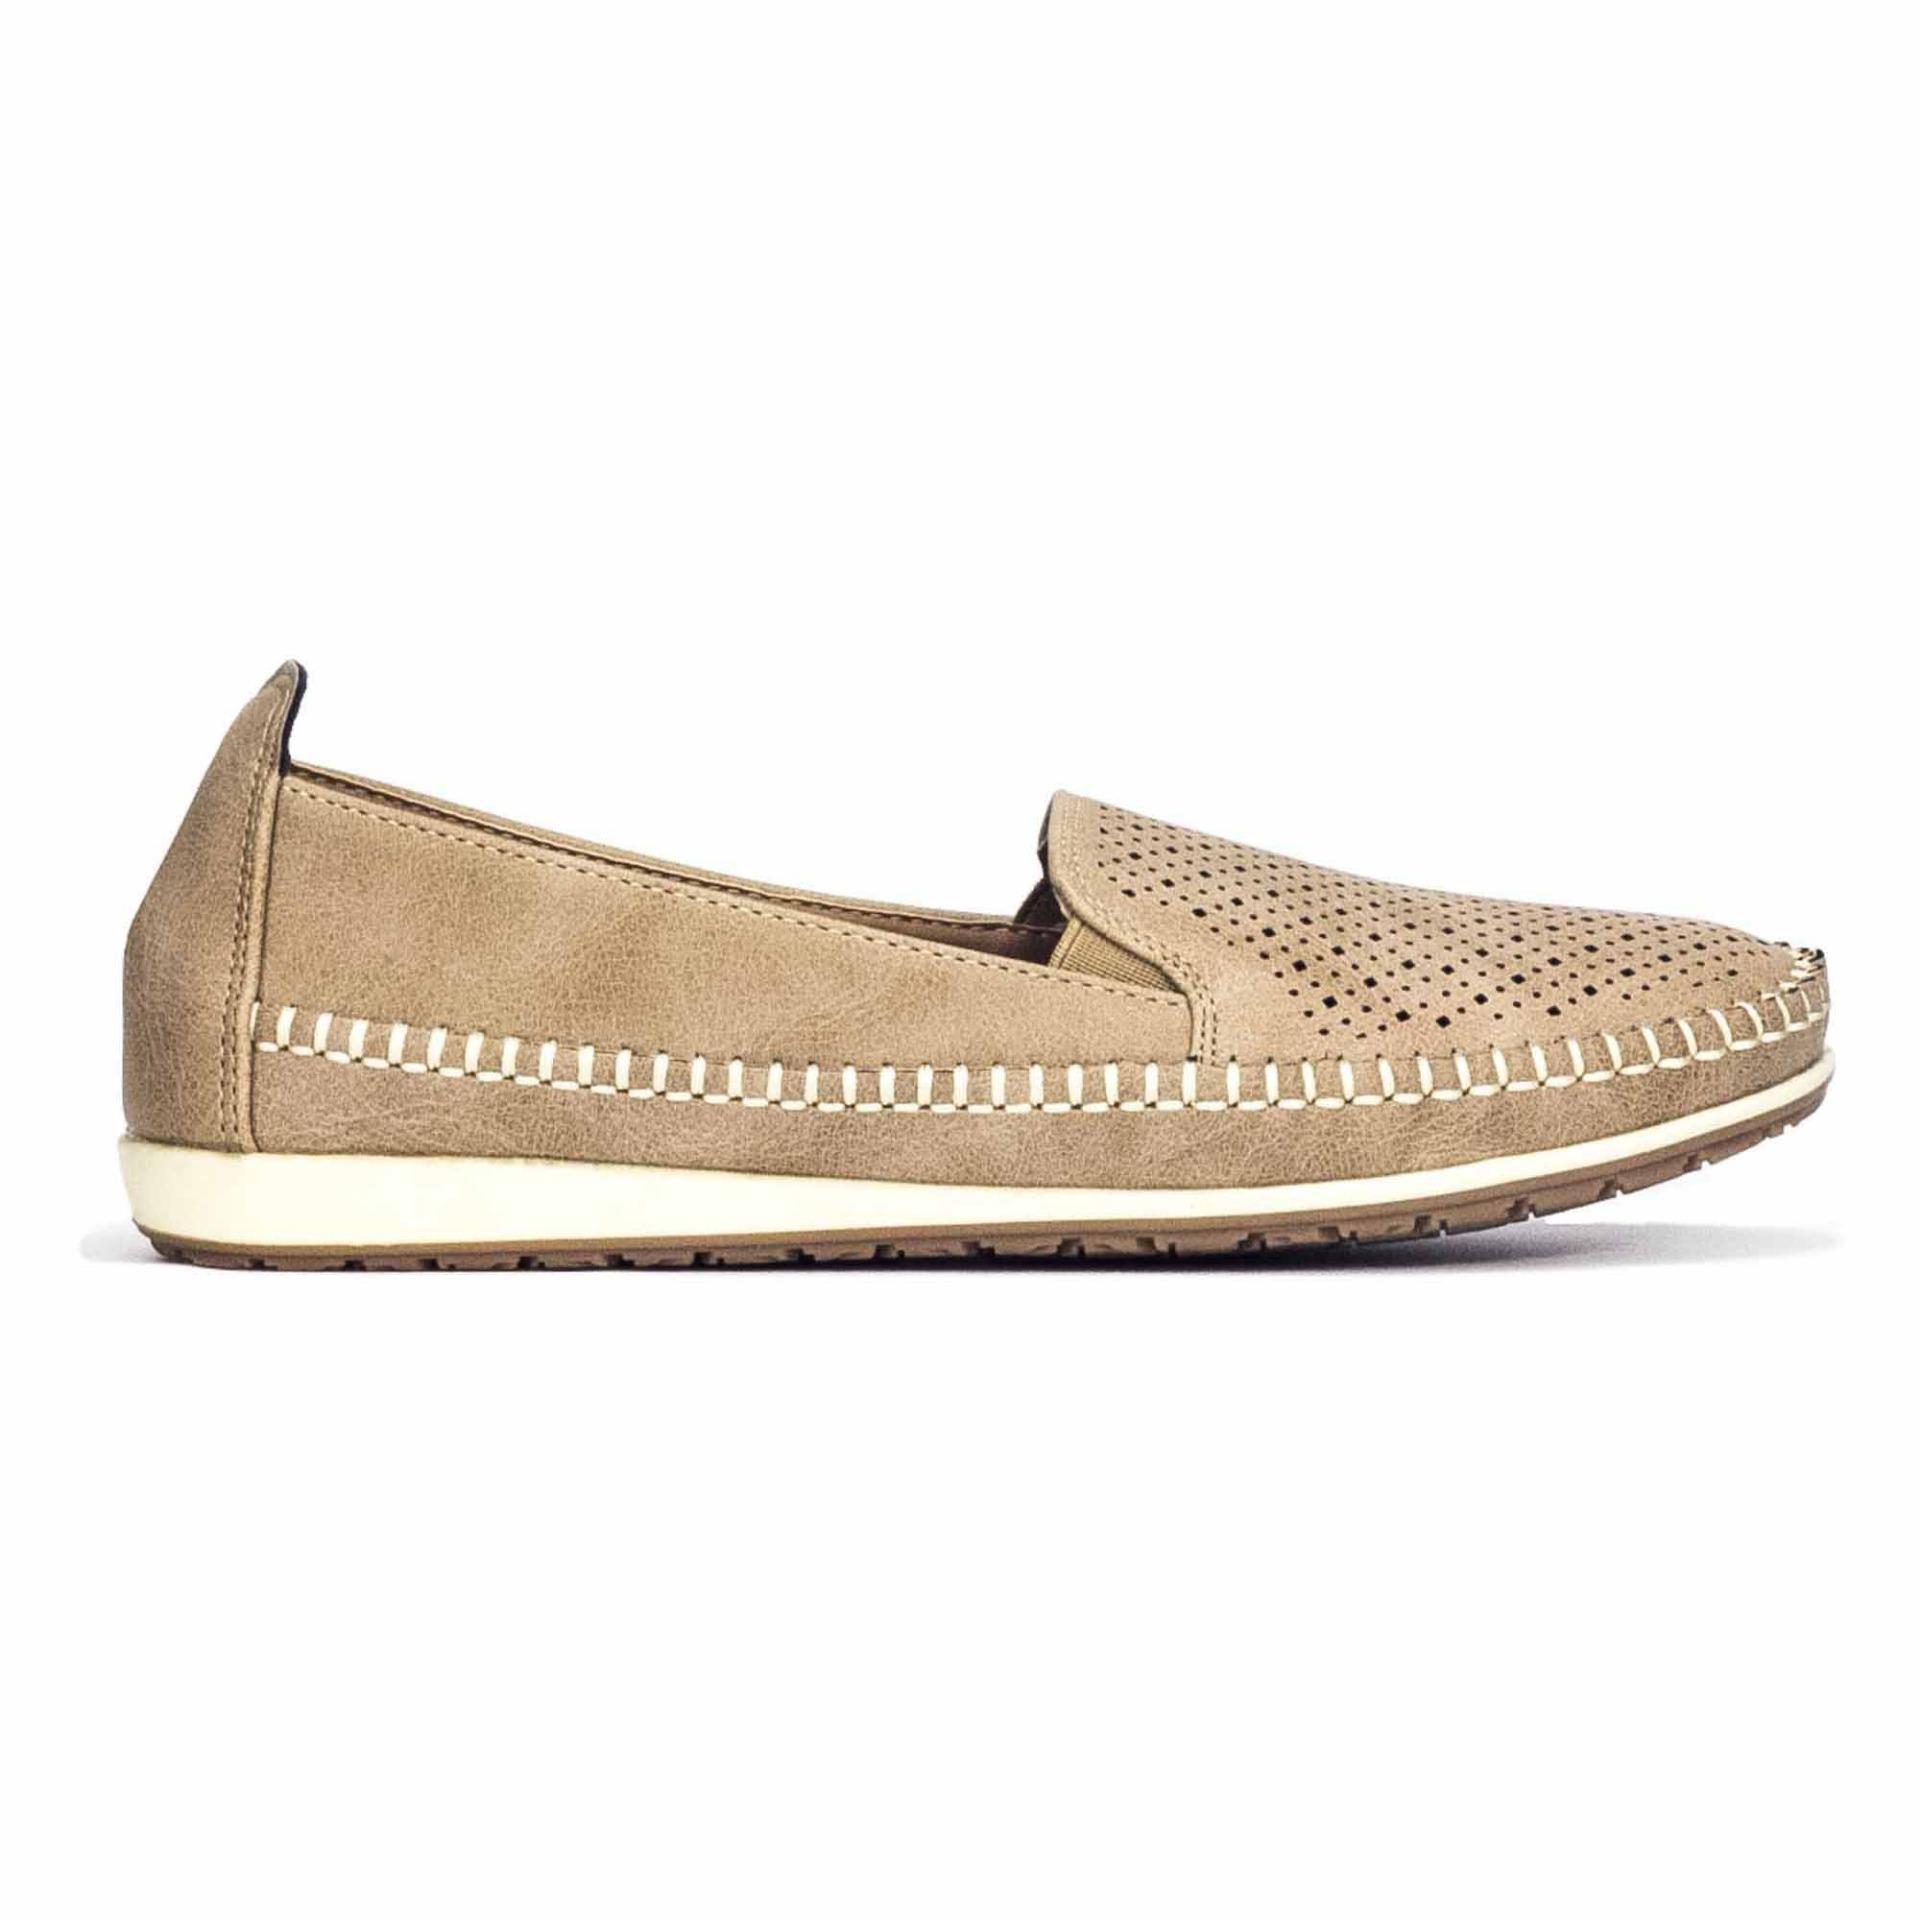 Bata Ladies Slip On Sand 5518106 For Sale Online